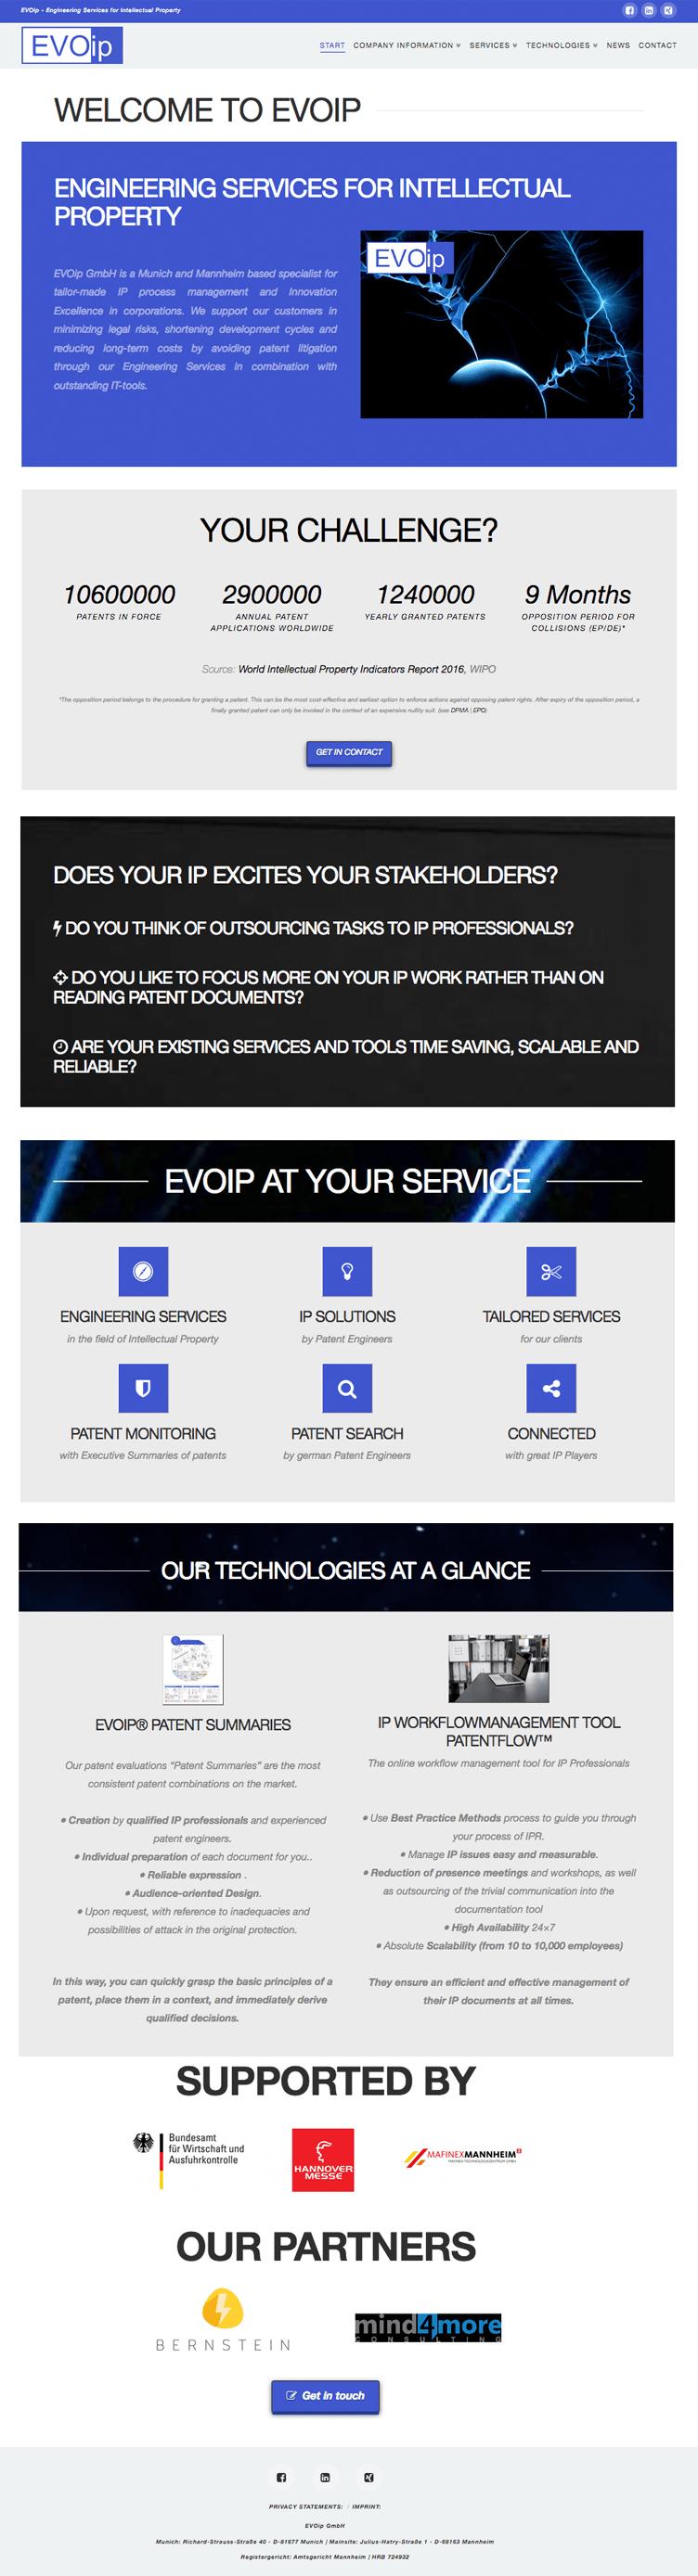 productized-service